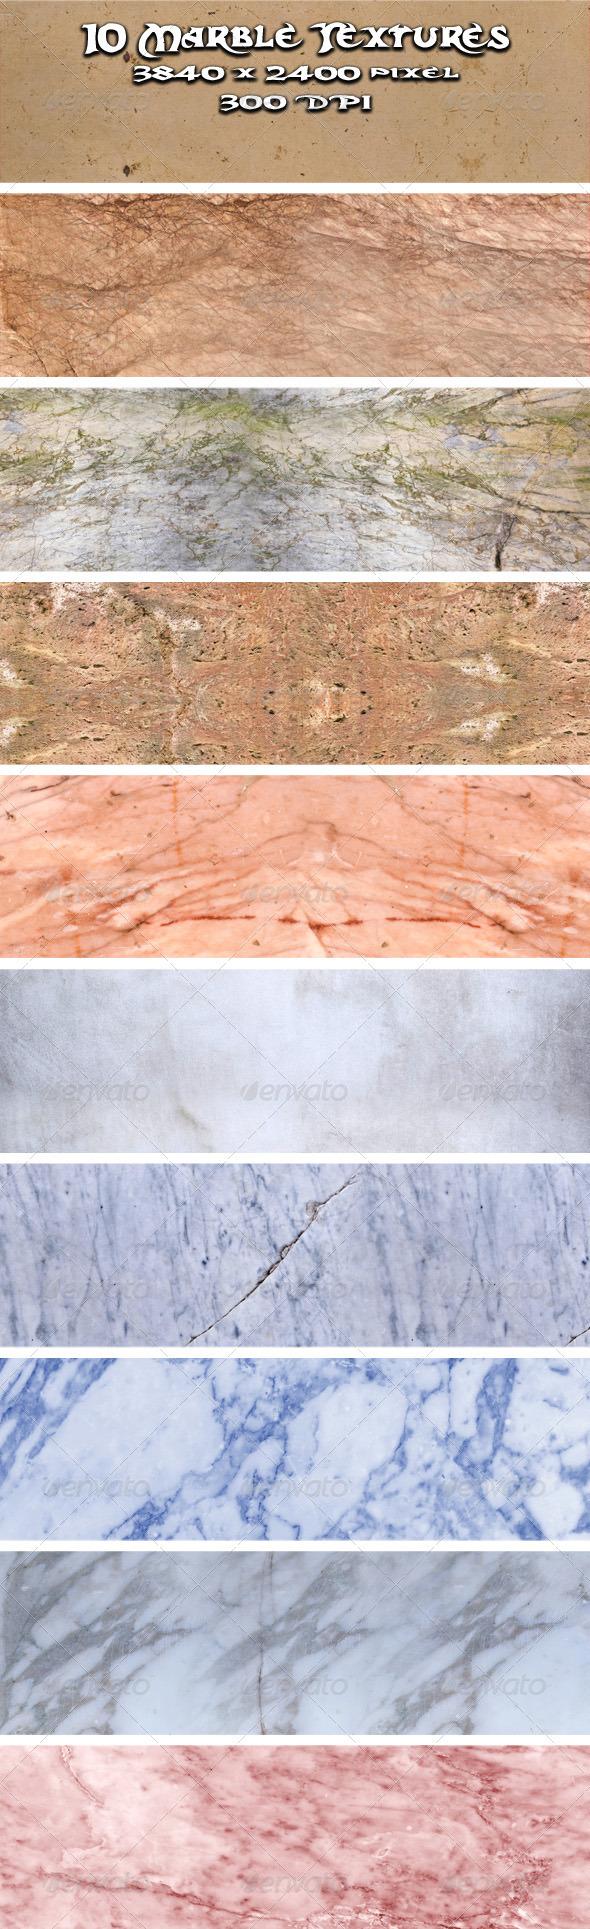 Marble Textures Vol.1 - Textures